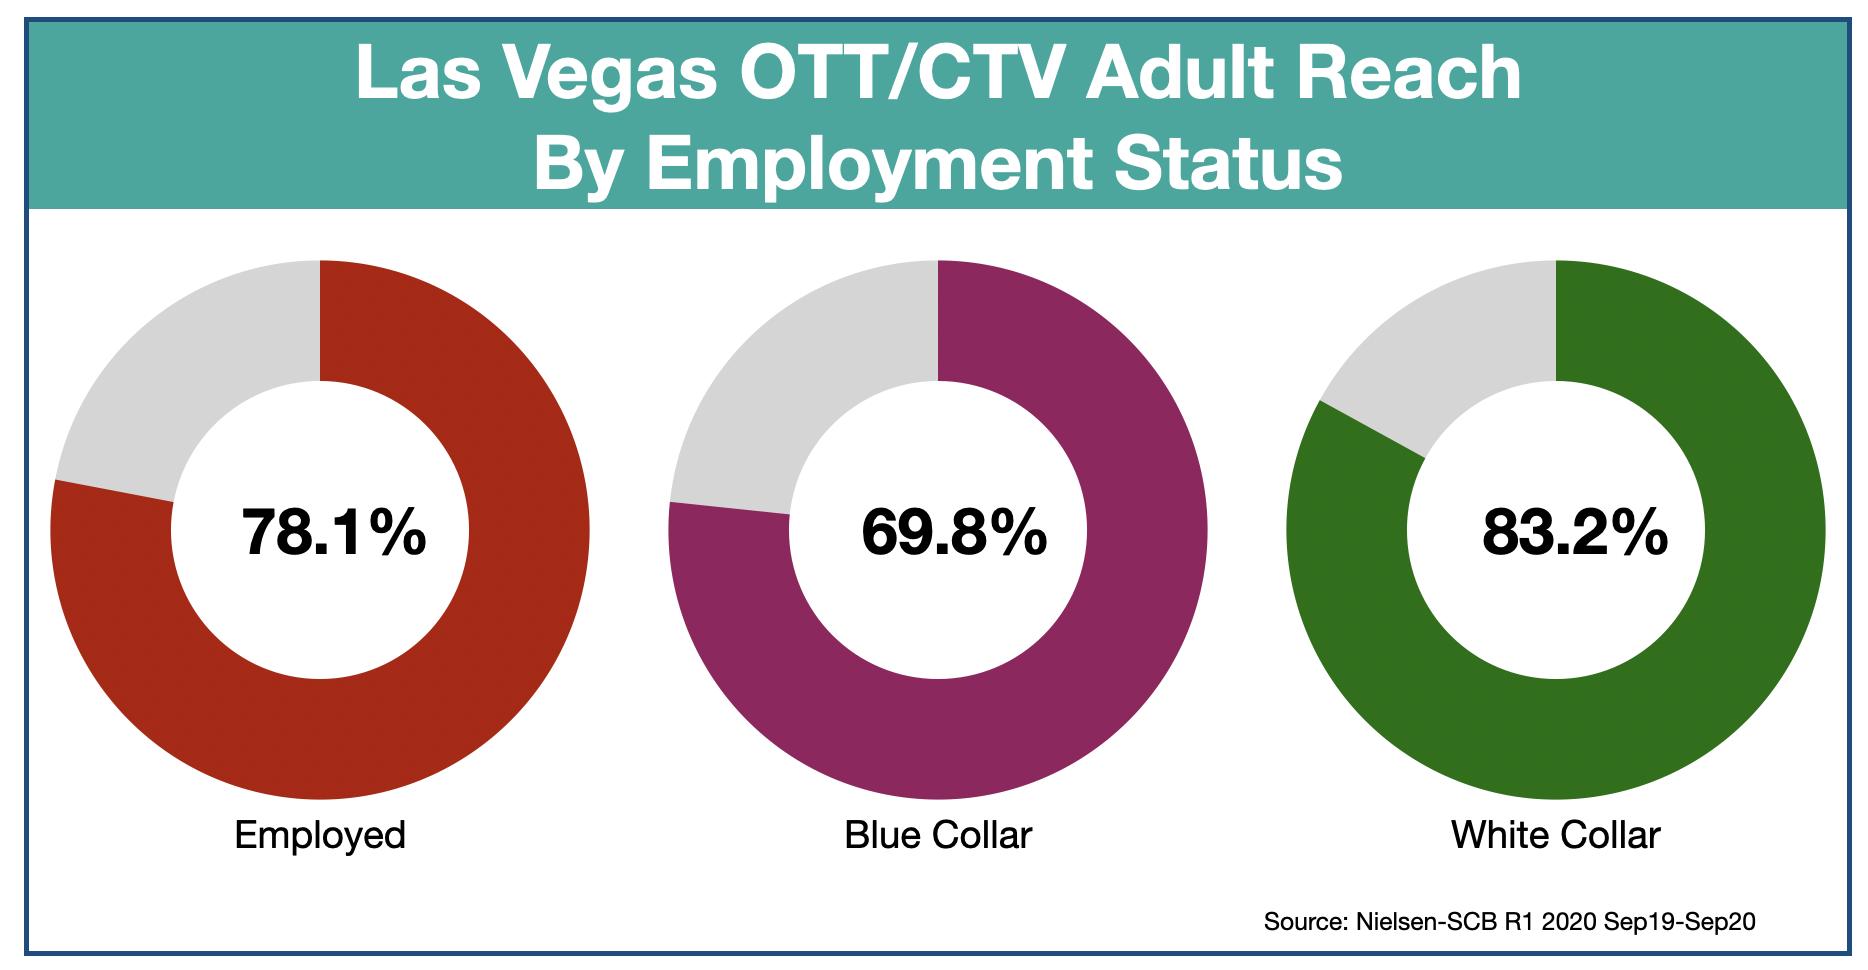 OTT & CTV advertising in Las Vegas Employment Status